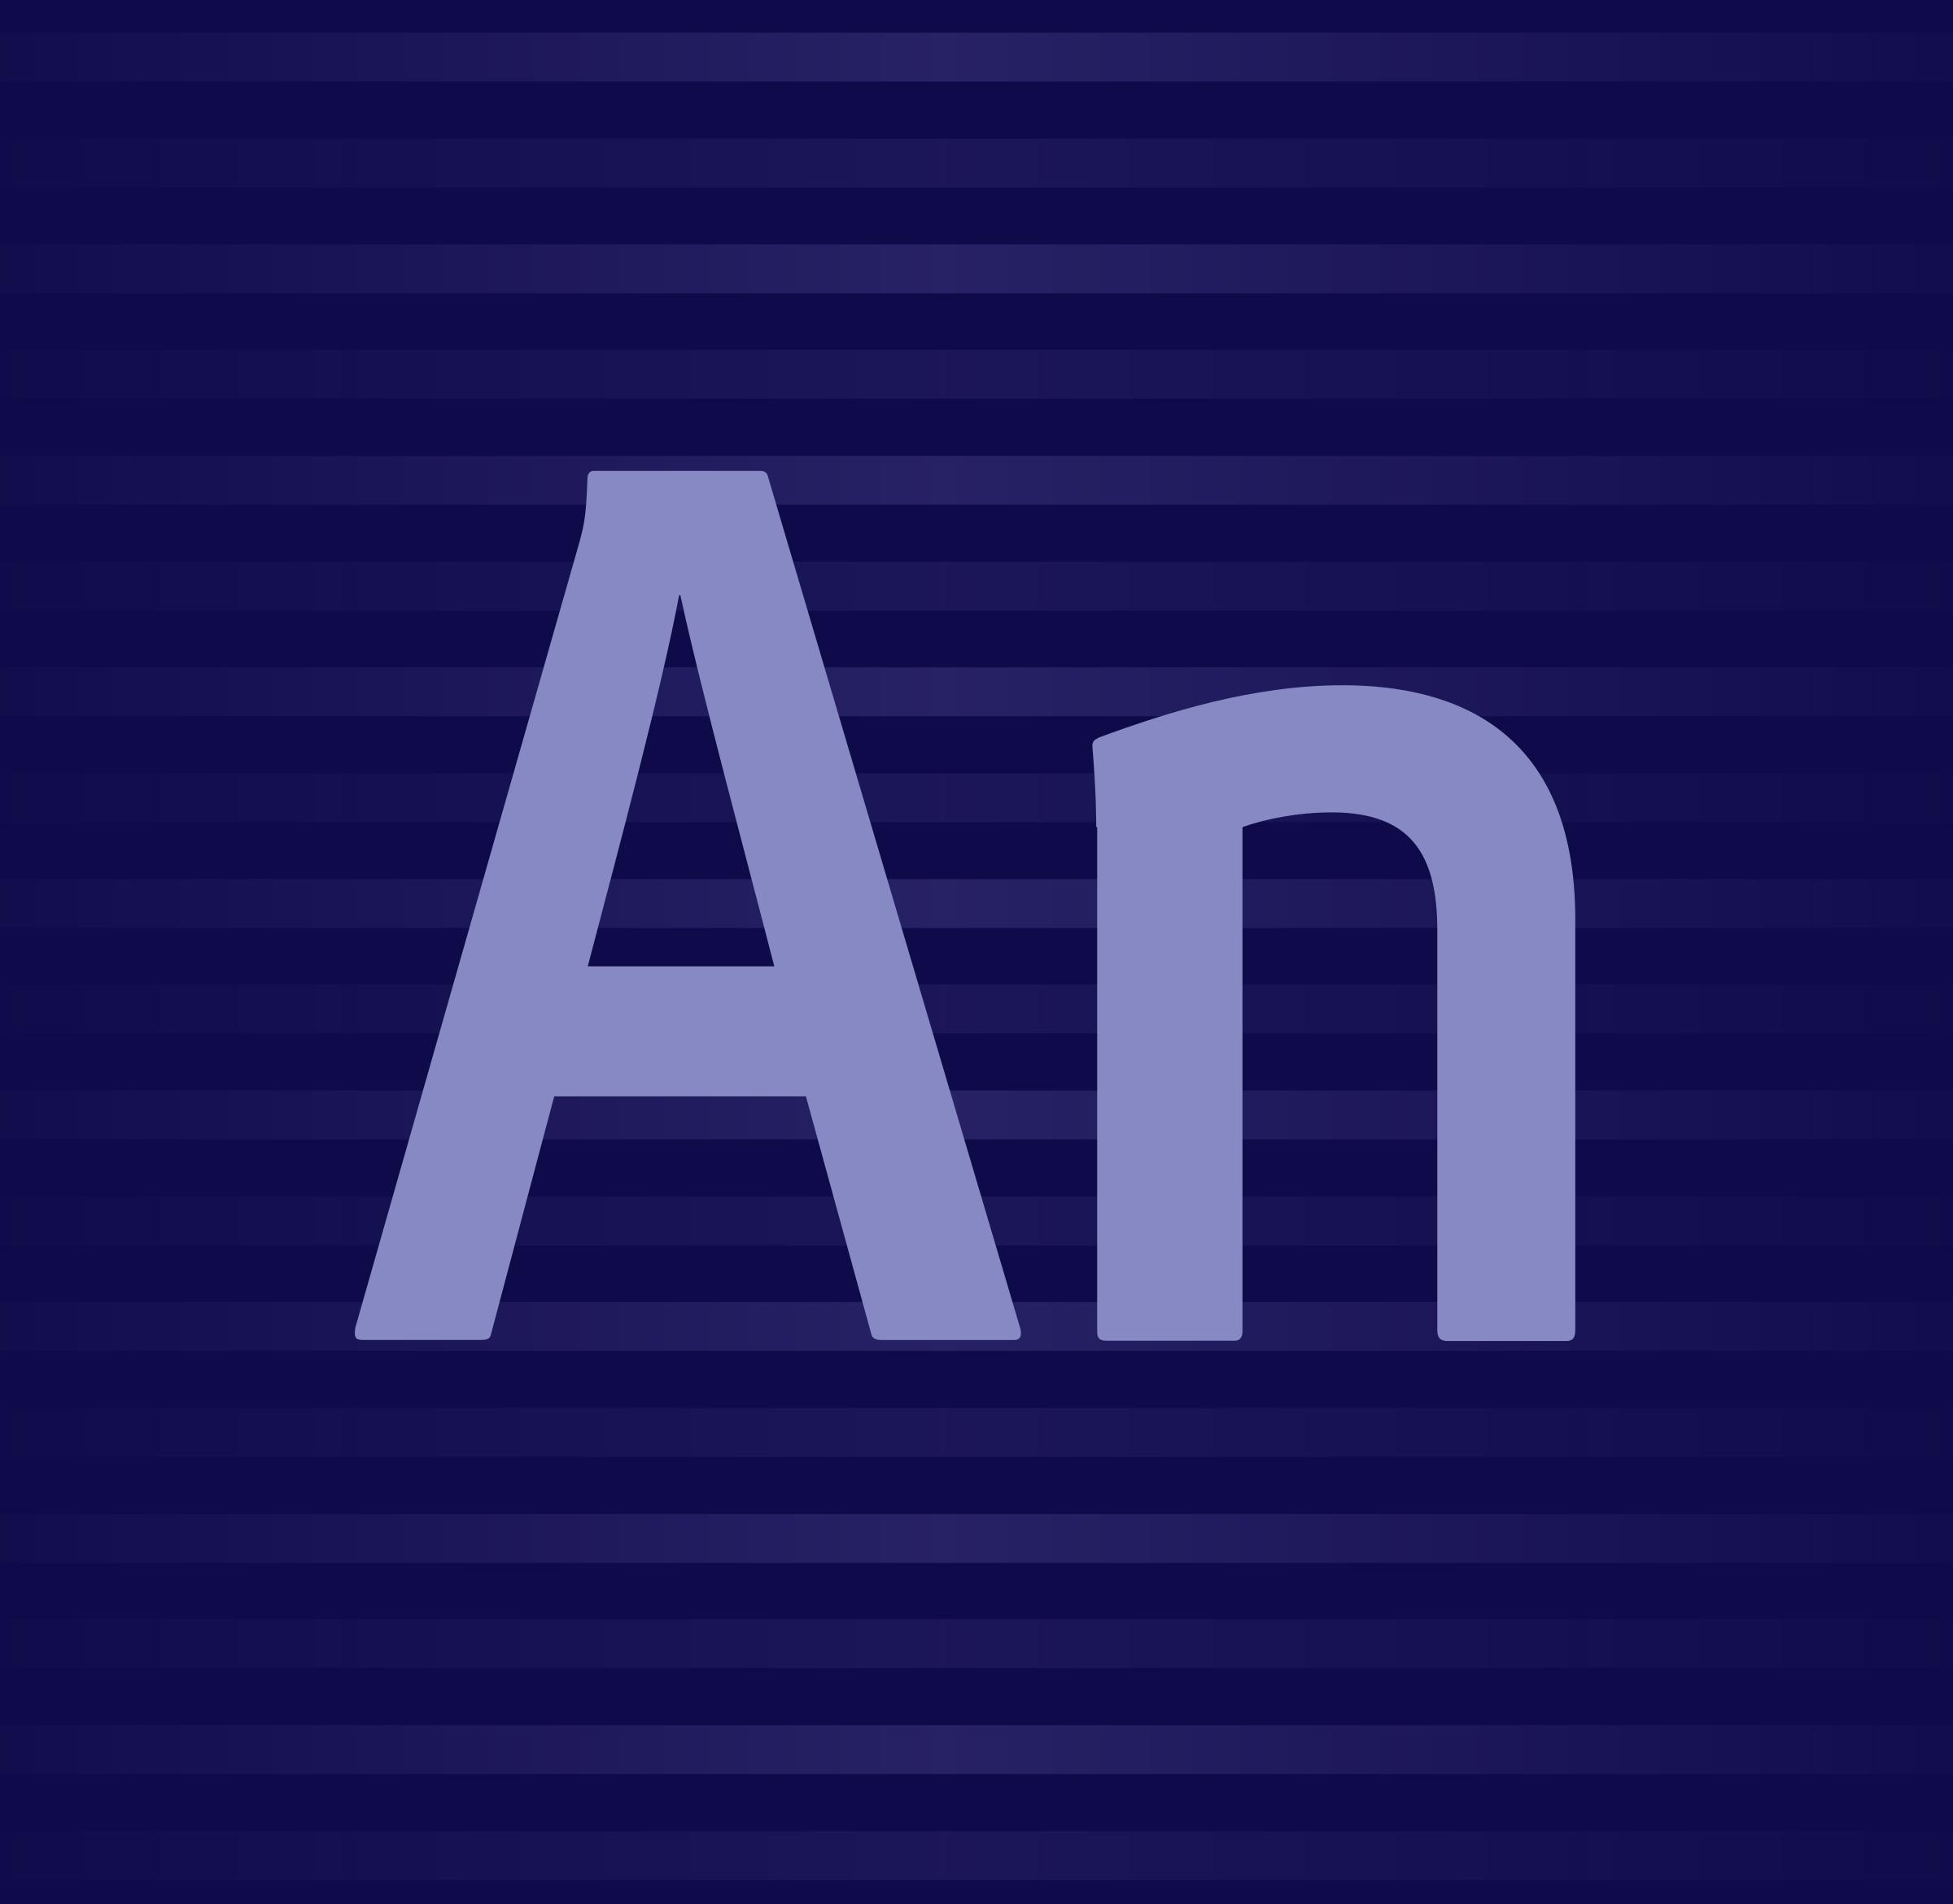 Edge Animate App CC Logo PNG Transparent & SVG Vector